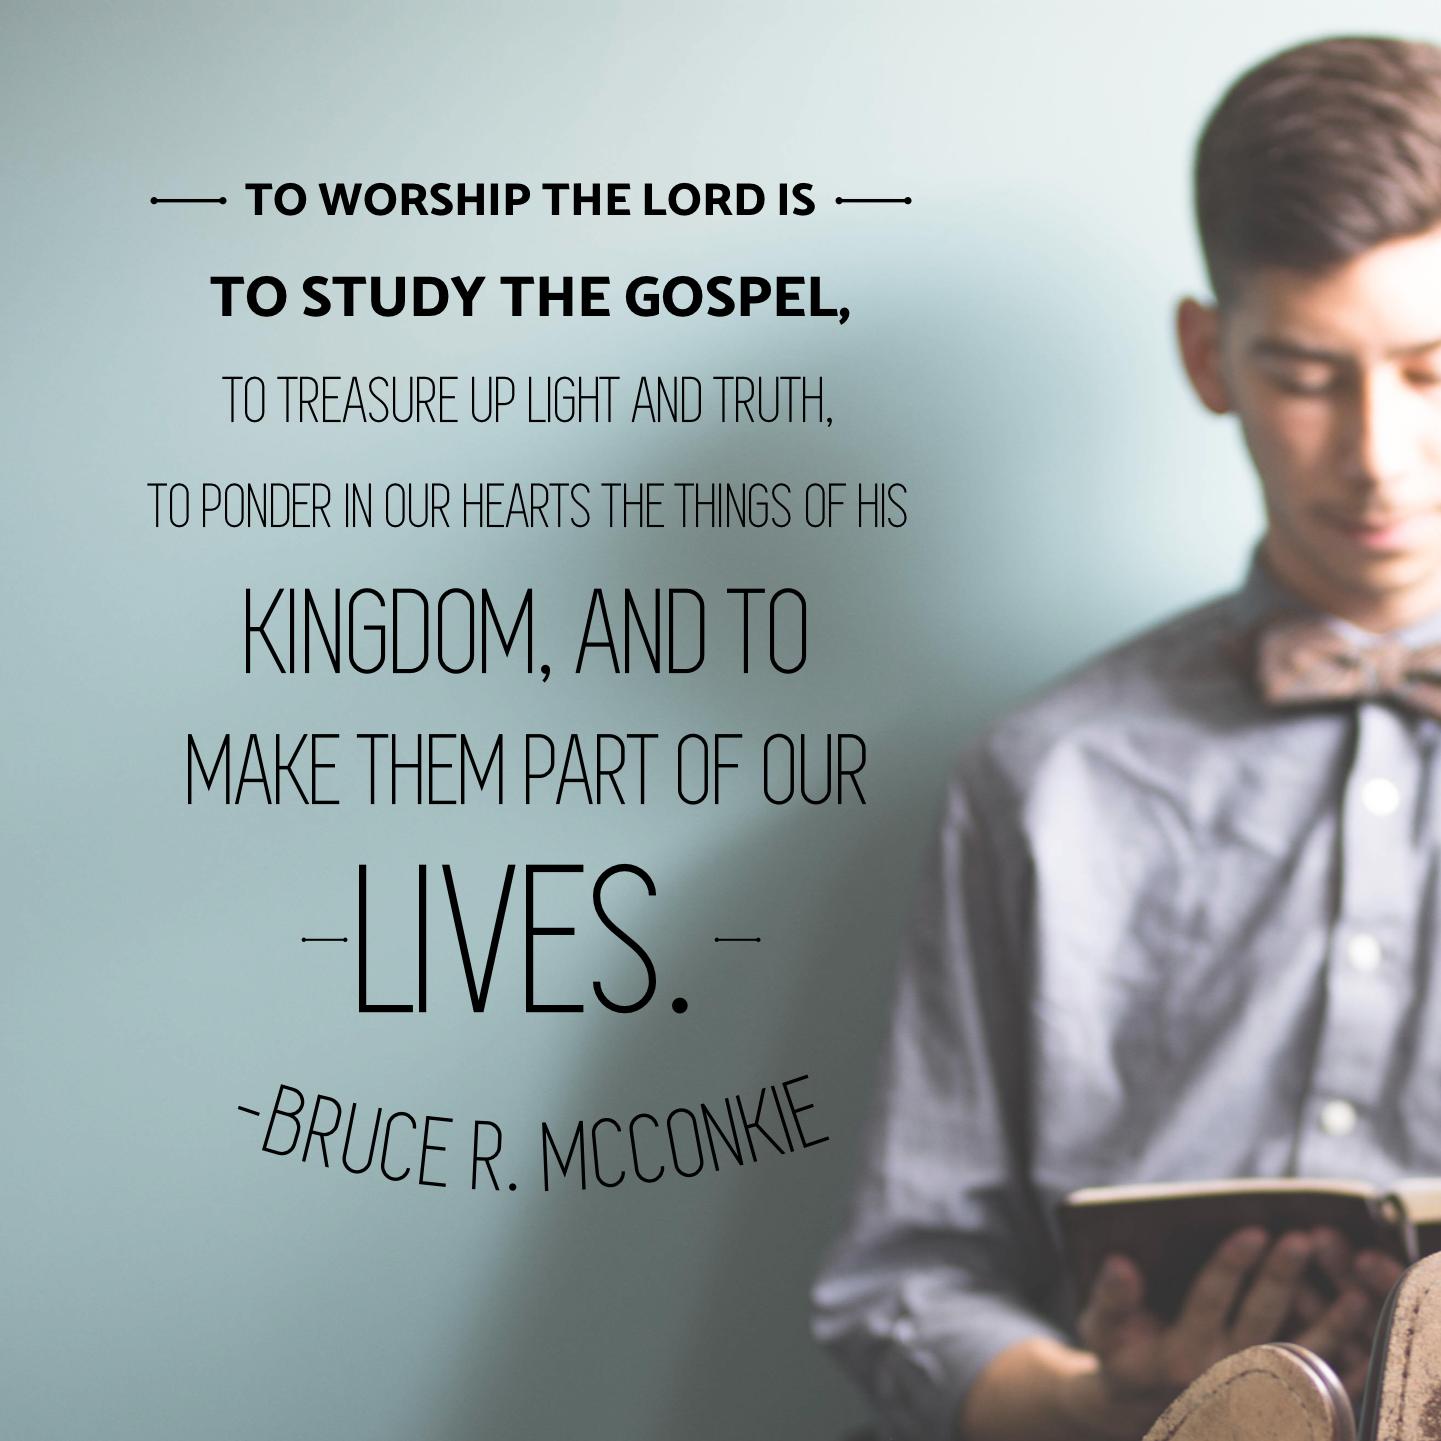 Ldsquotes Ldsconf Lds Worship Scripture Study Knowledge Truth